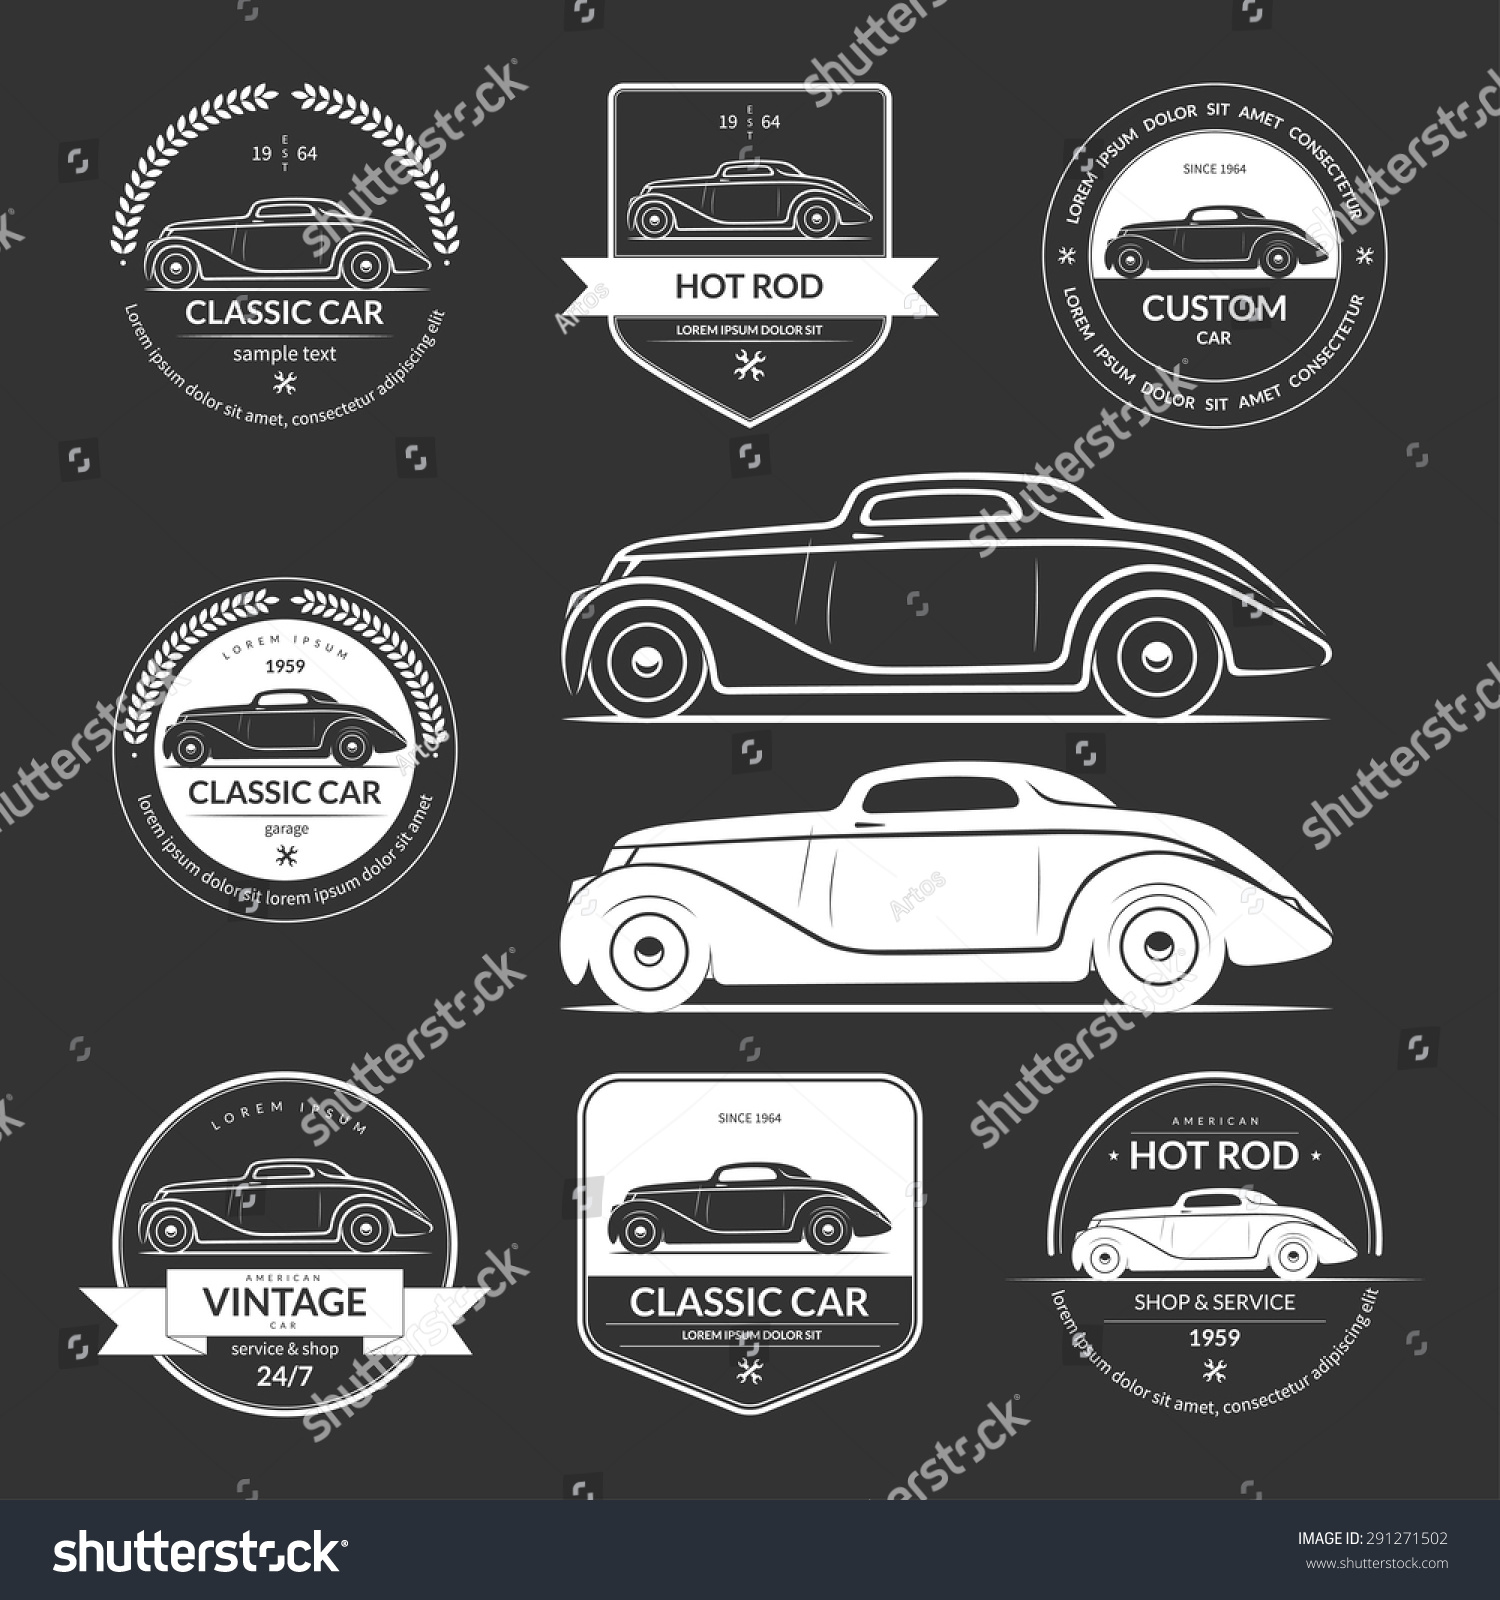 Design car emblem - Set Of Hot Rod Classic Vintage Car Service Labels Emblems Logos